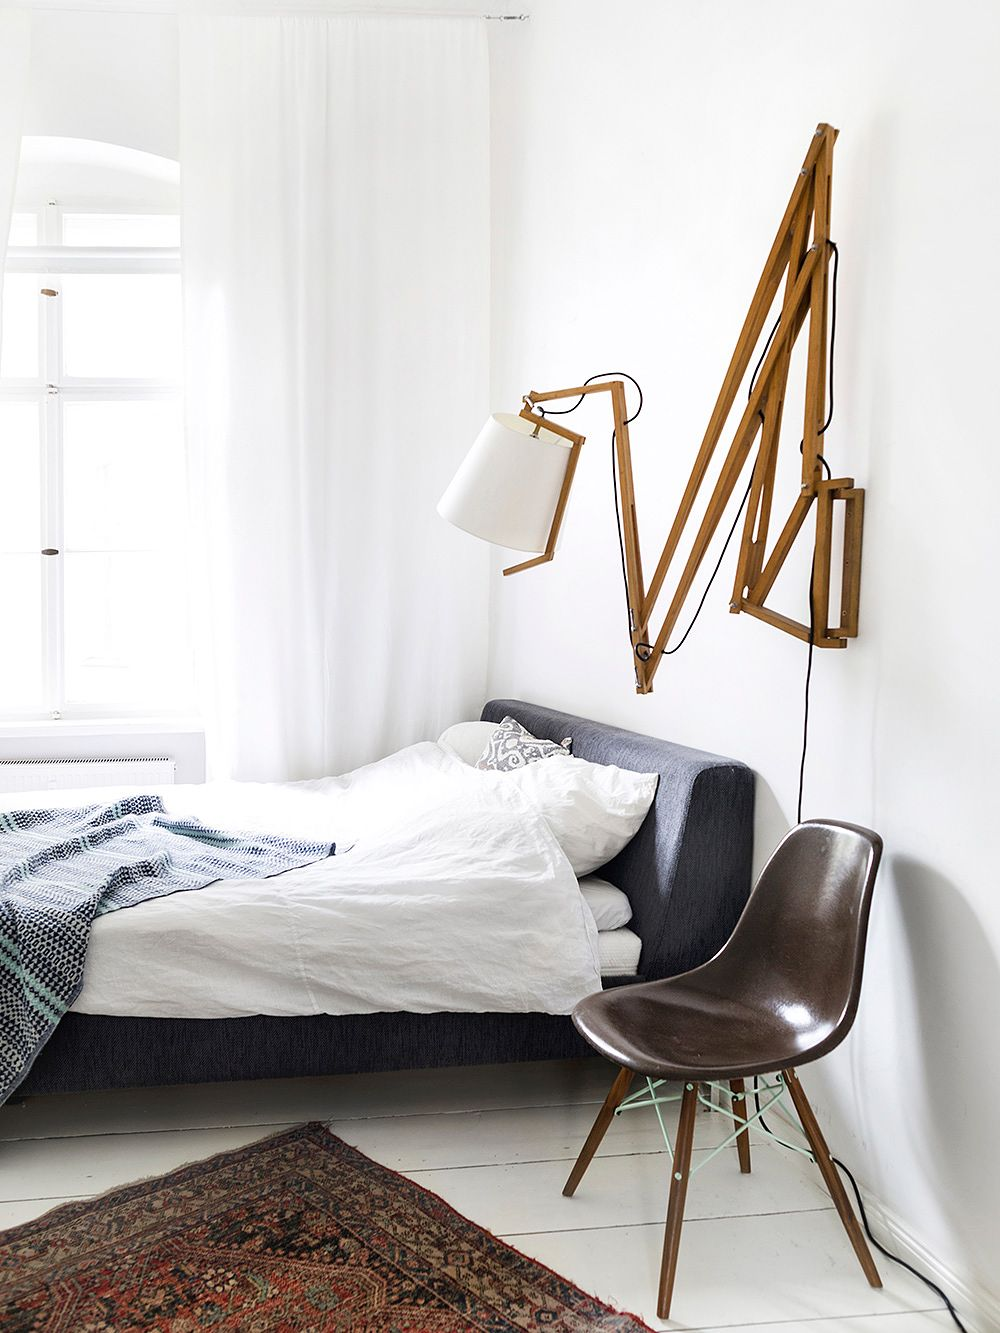 Three rooms in Kreutzberg | Design Stories